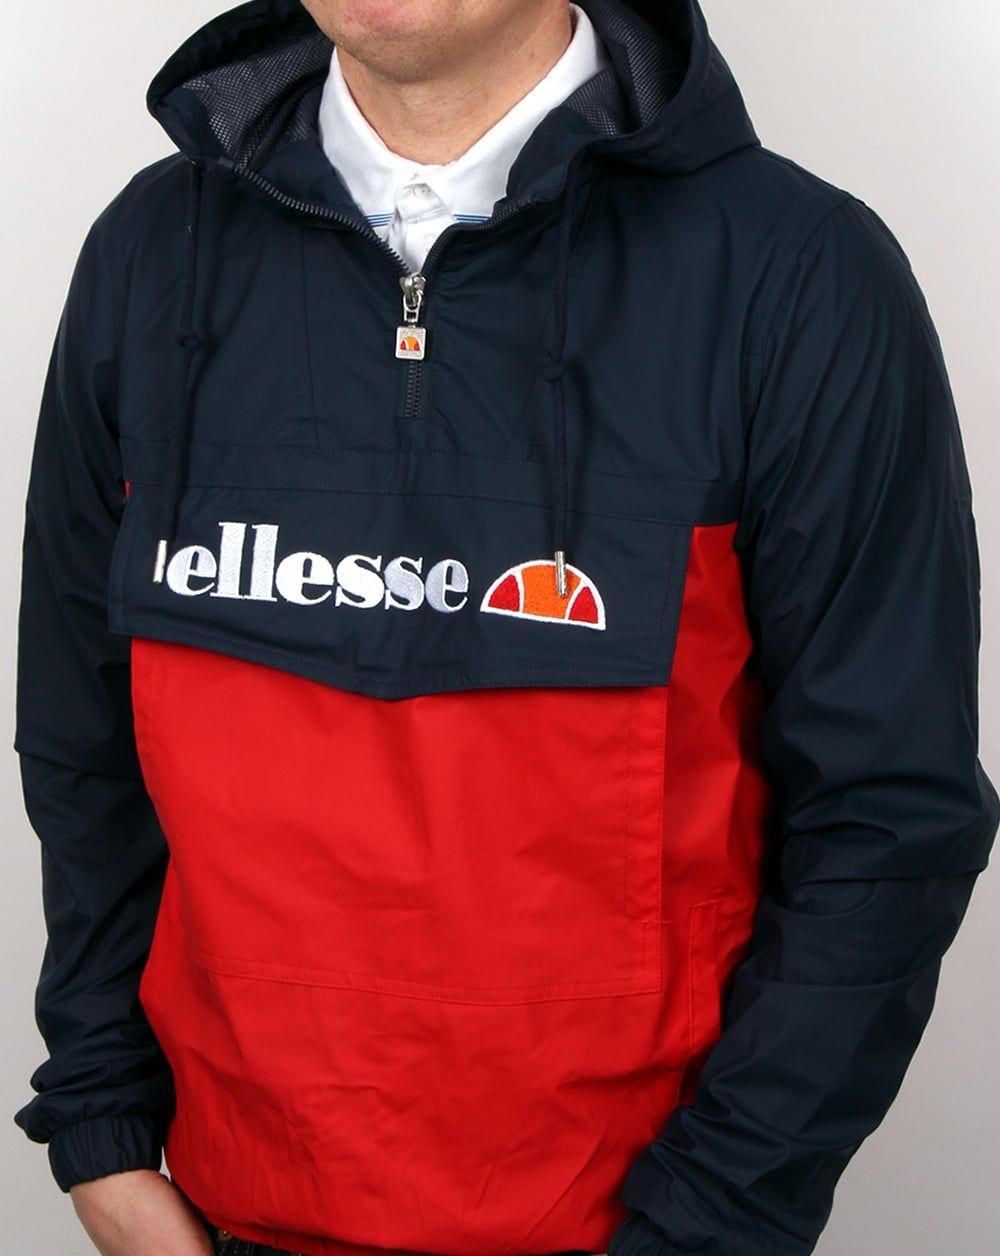 6f4c28ab3d Ellesse Mont Brava Quarter Zip Jacket Navy/Red | ellesse looks in ...